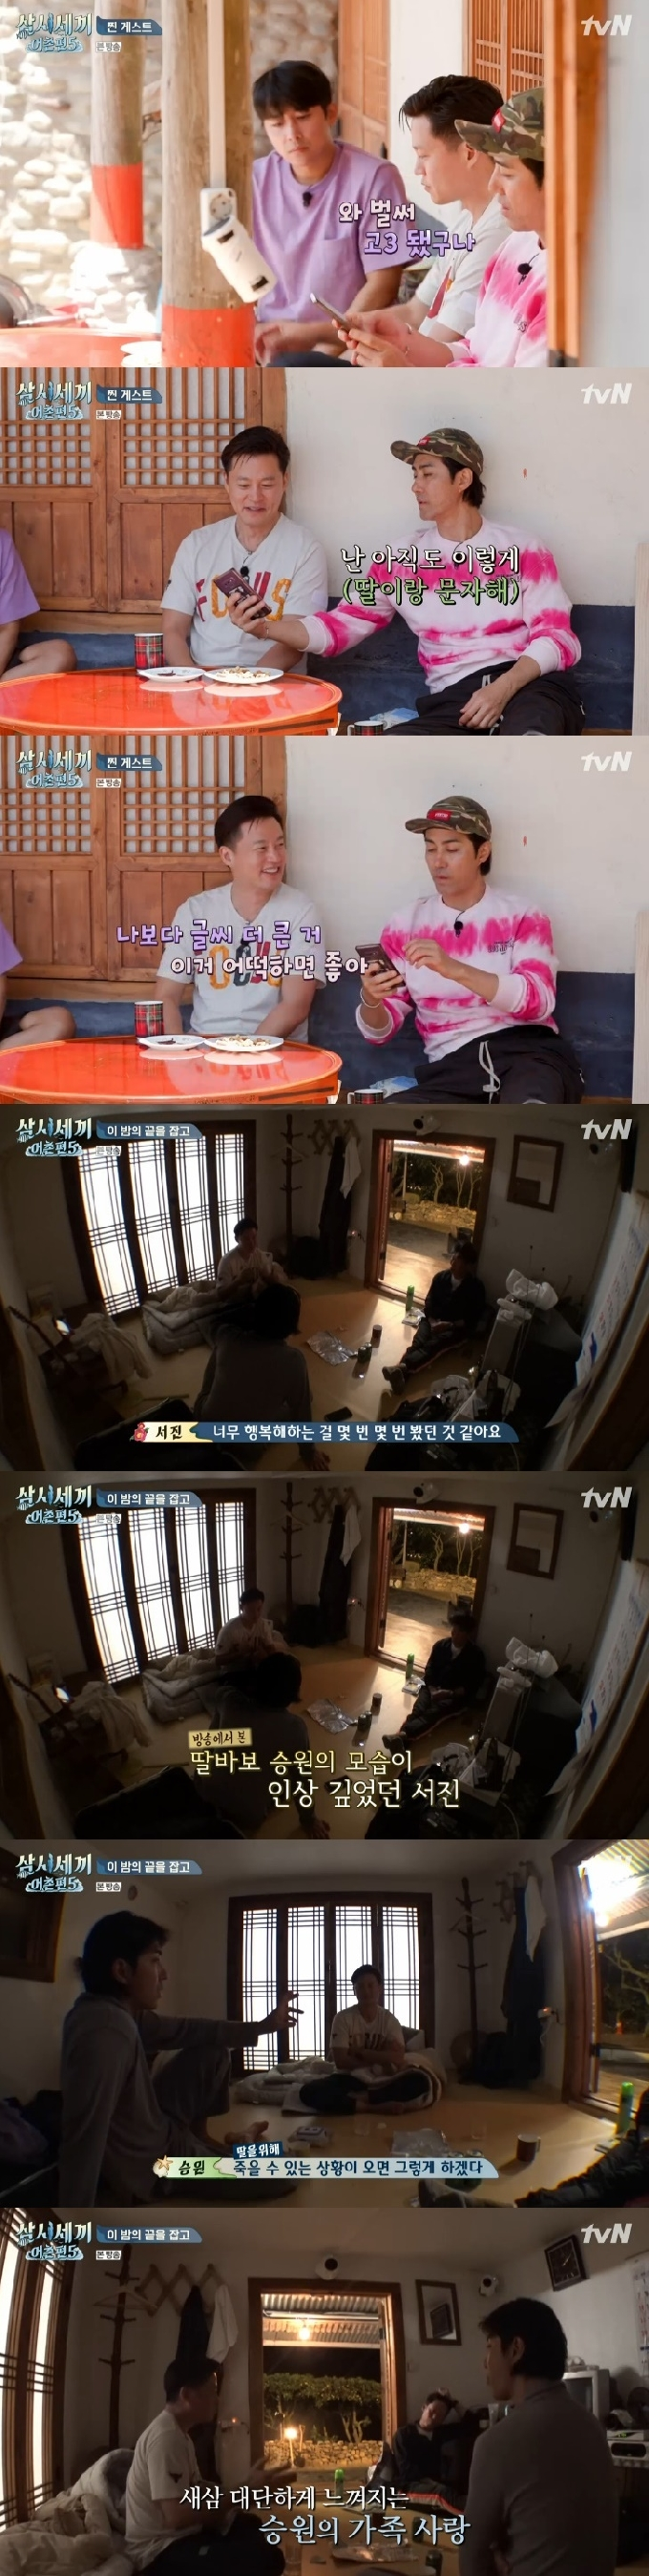 [RE:TV] '삼시세끼 어촌편5' 차승원, 딸 예니 향한 사랑…